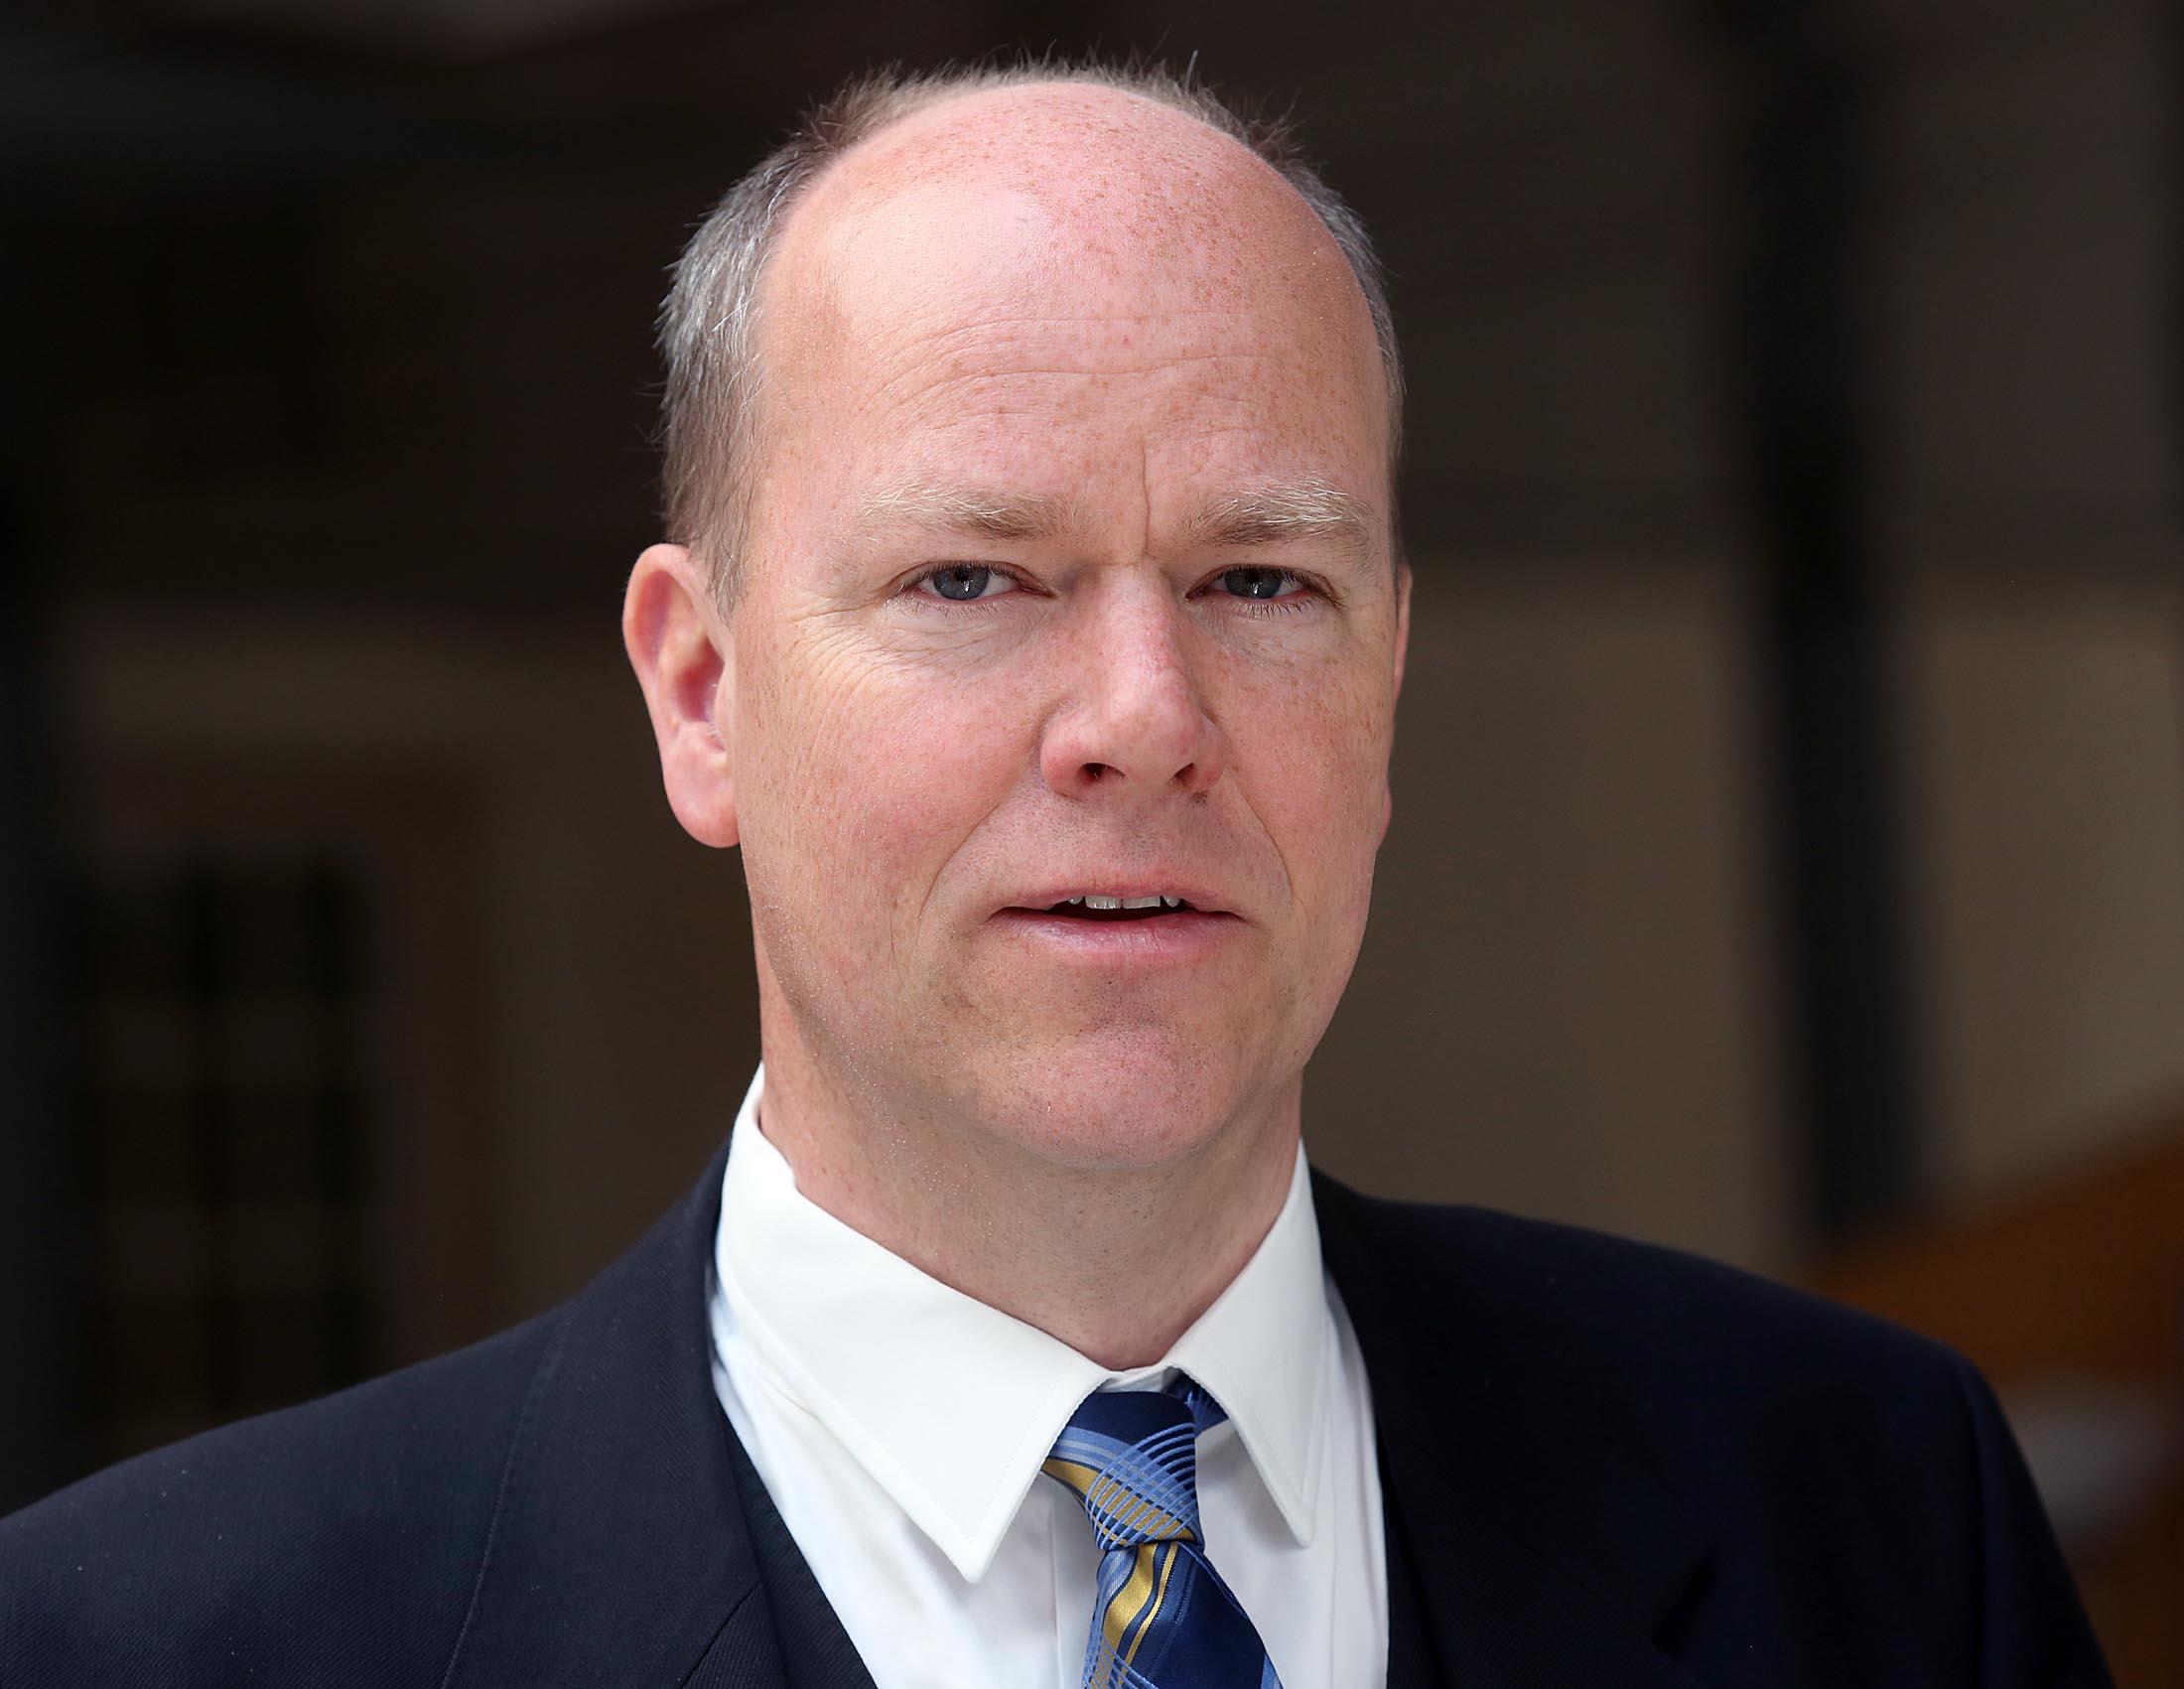 Gordon Lindhurst MSP